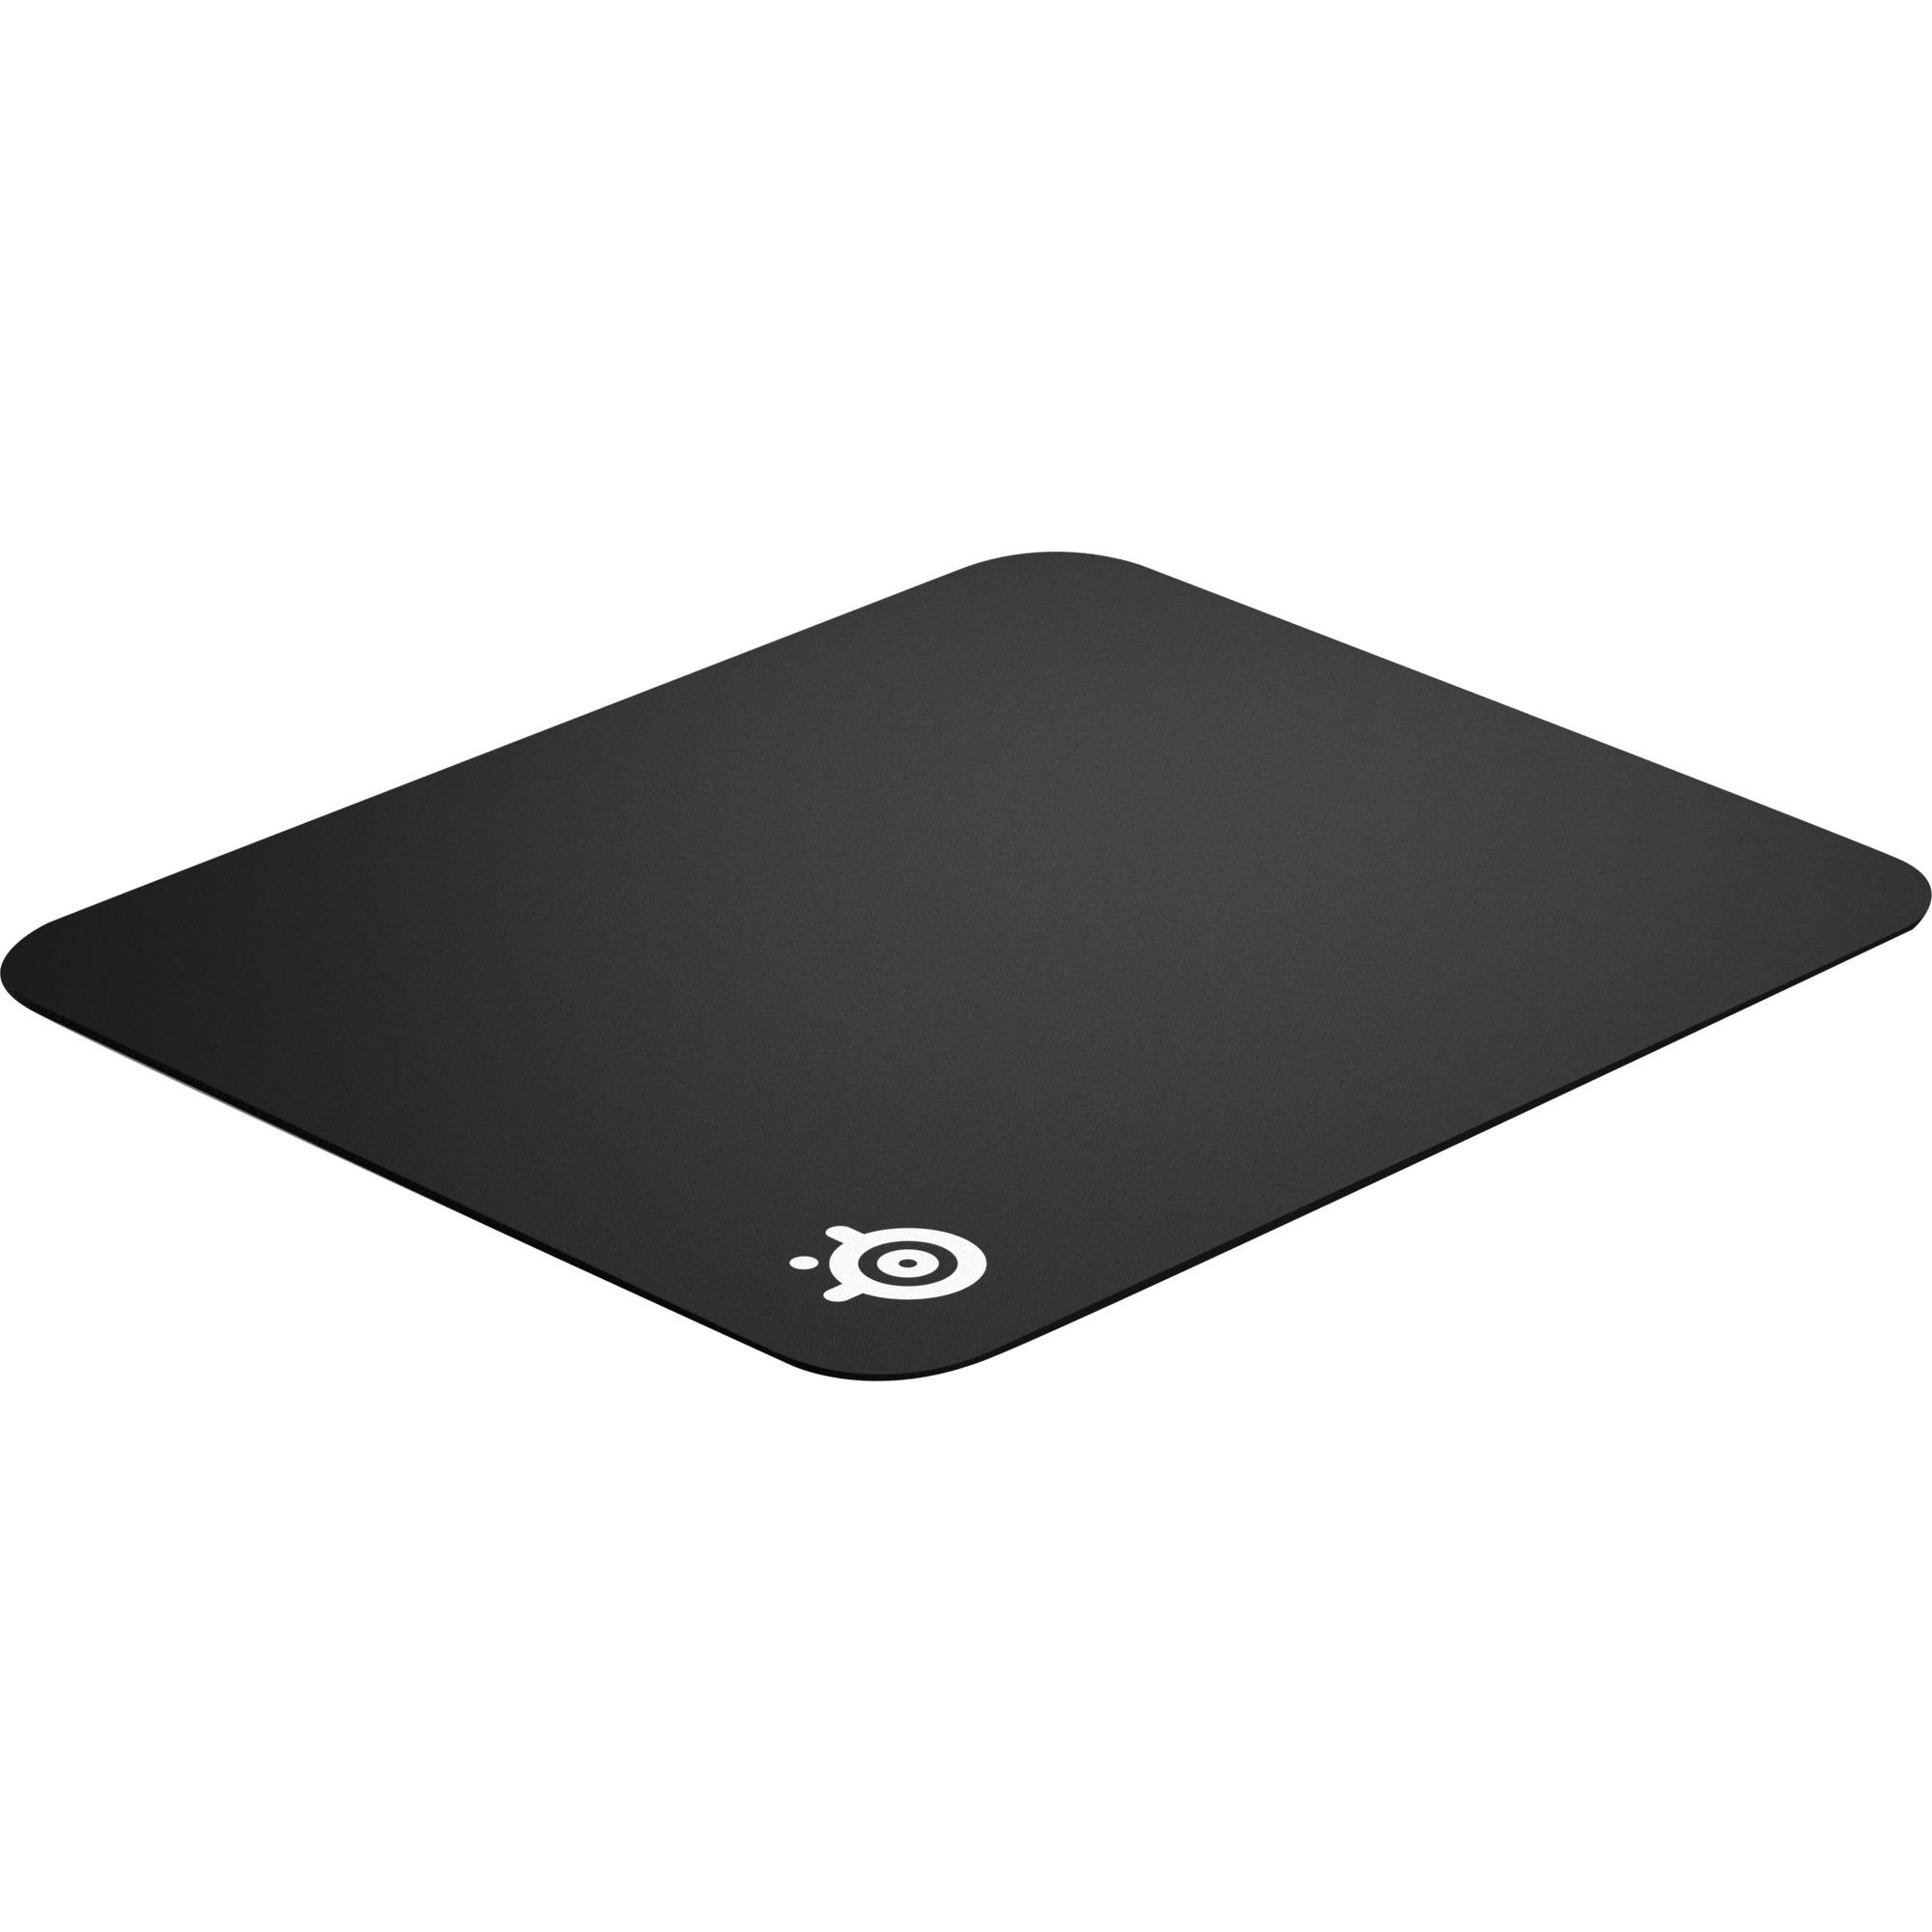 QcK - Pro Gaming Mousepad